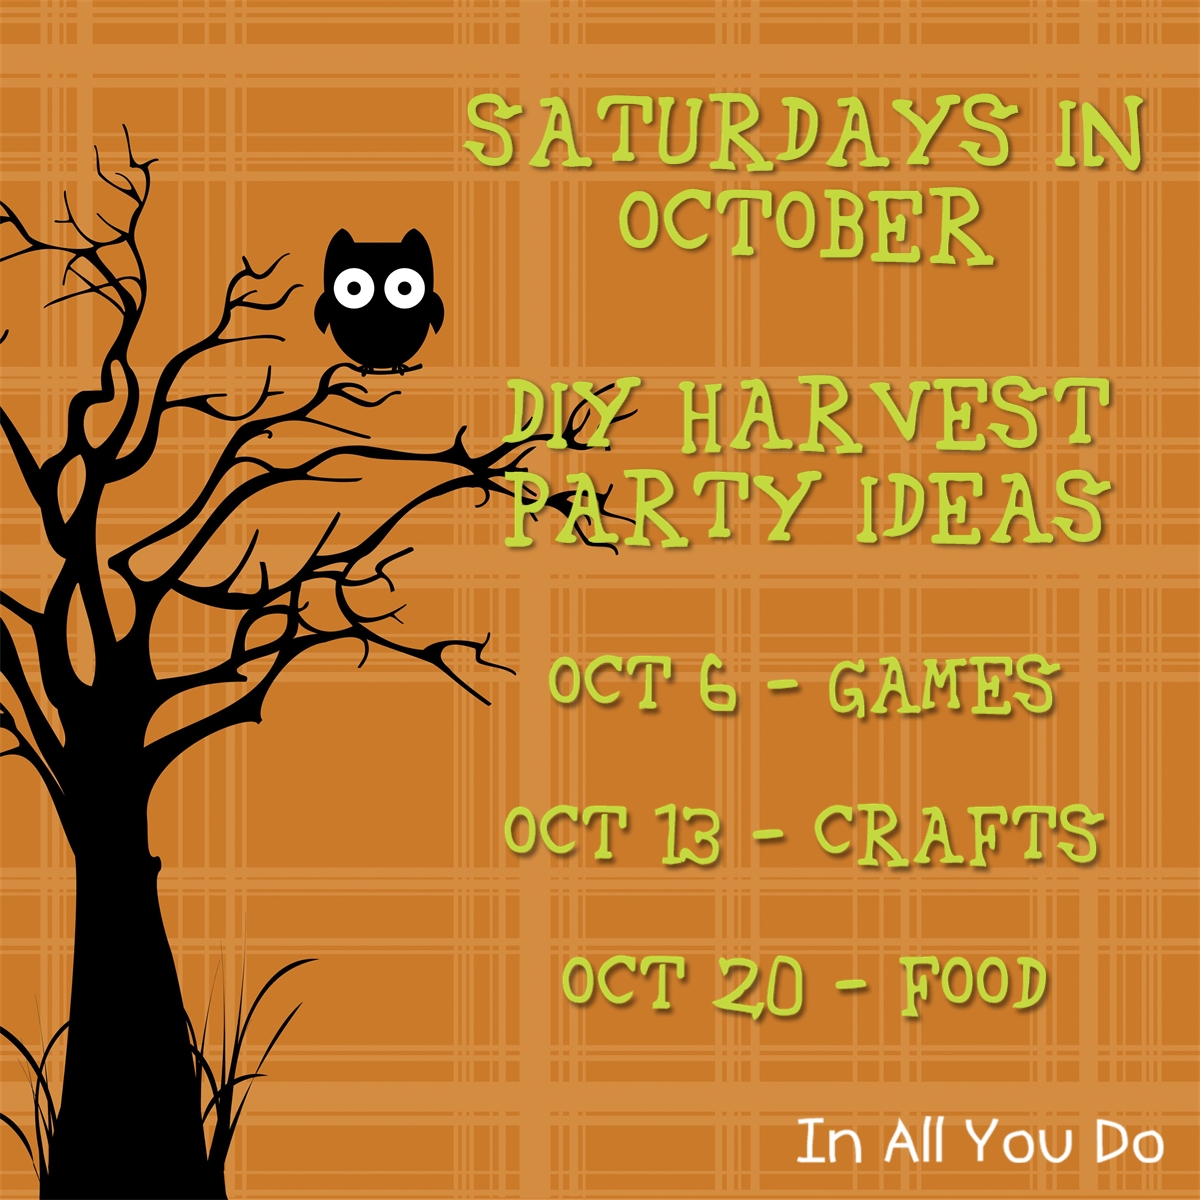 DIY Harvest Party: Food